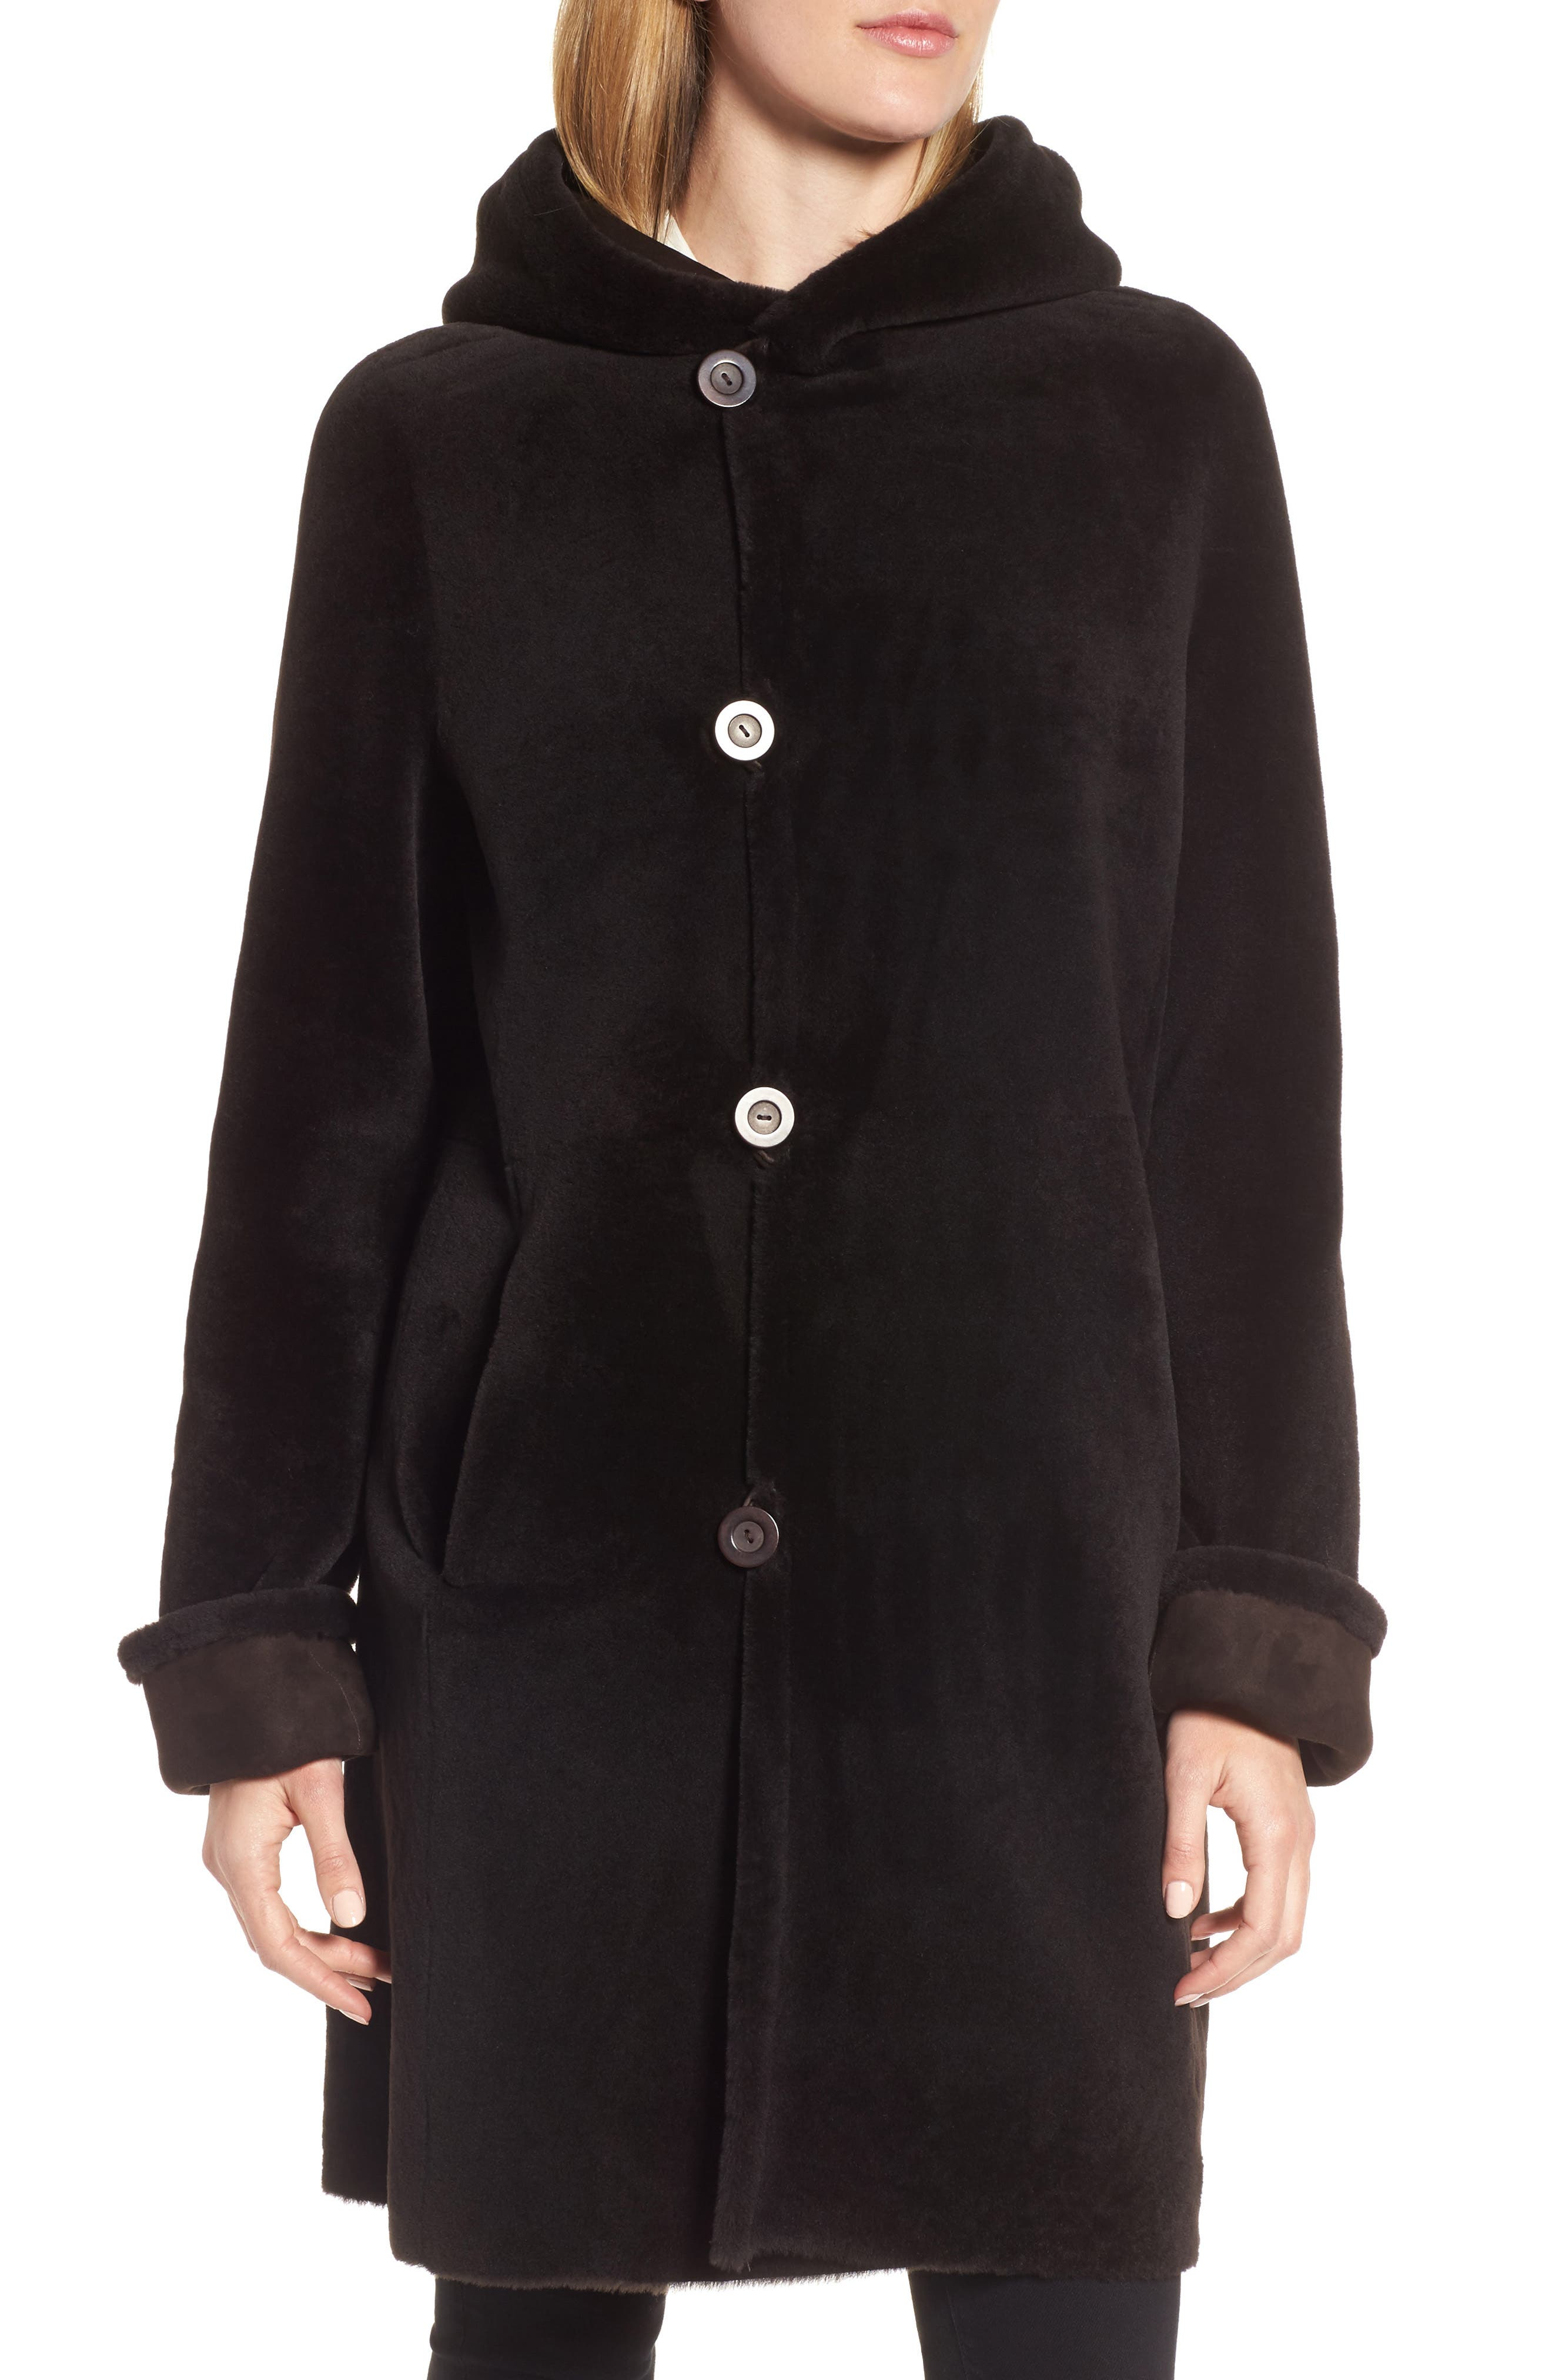 Hooded Genuine Shearling Coat,                             Alternate thumbnail 4, color,                             206